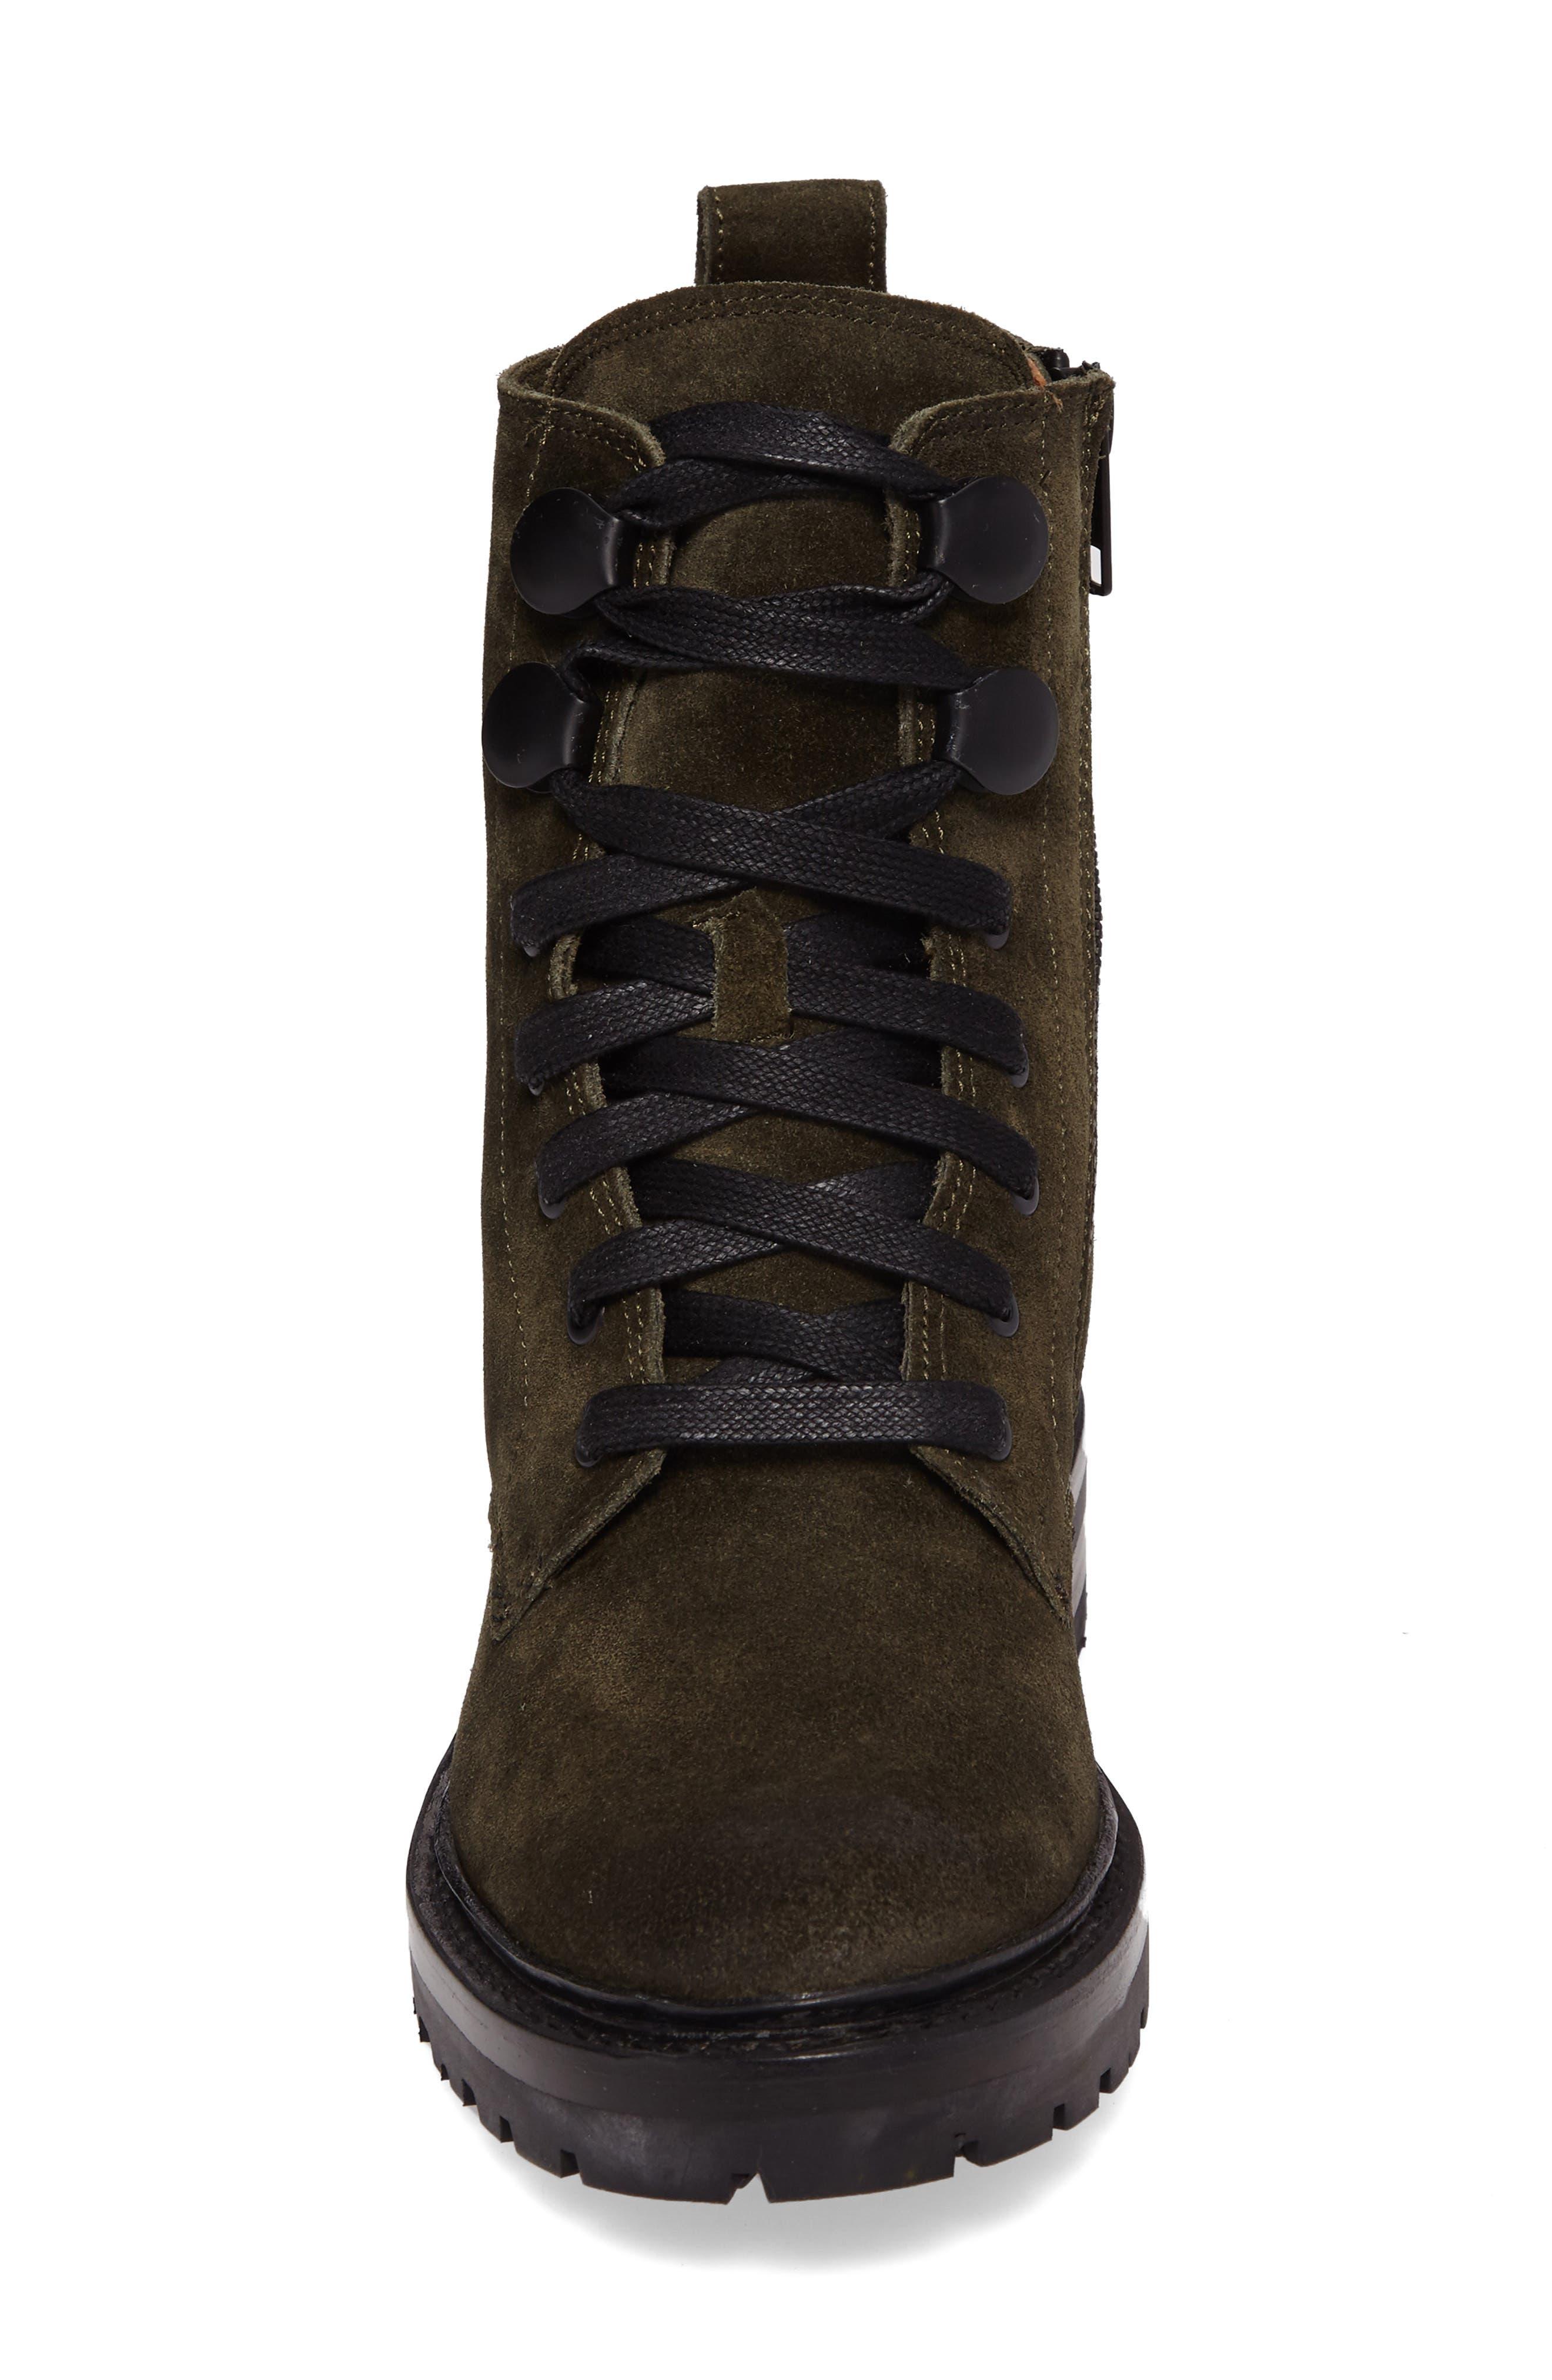 Julie Hook Combat Boot,                             Alternate thumbnail 4, color,                             Forest